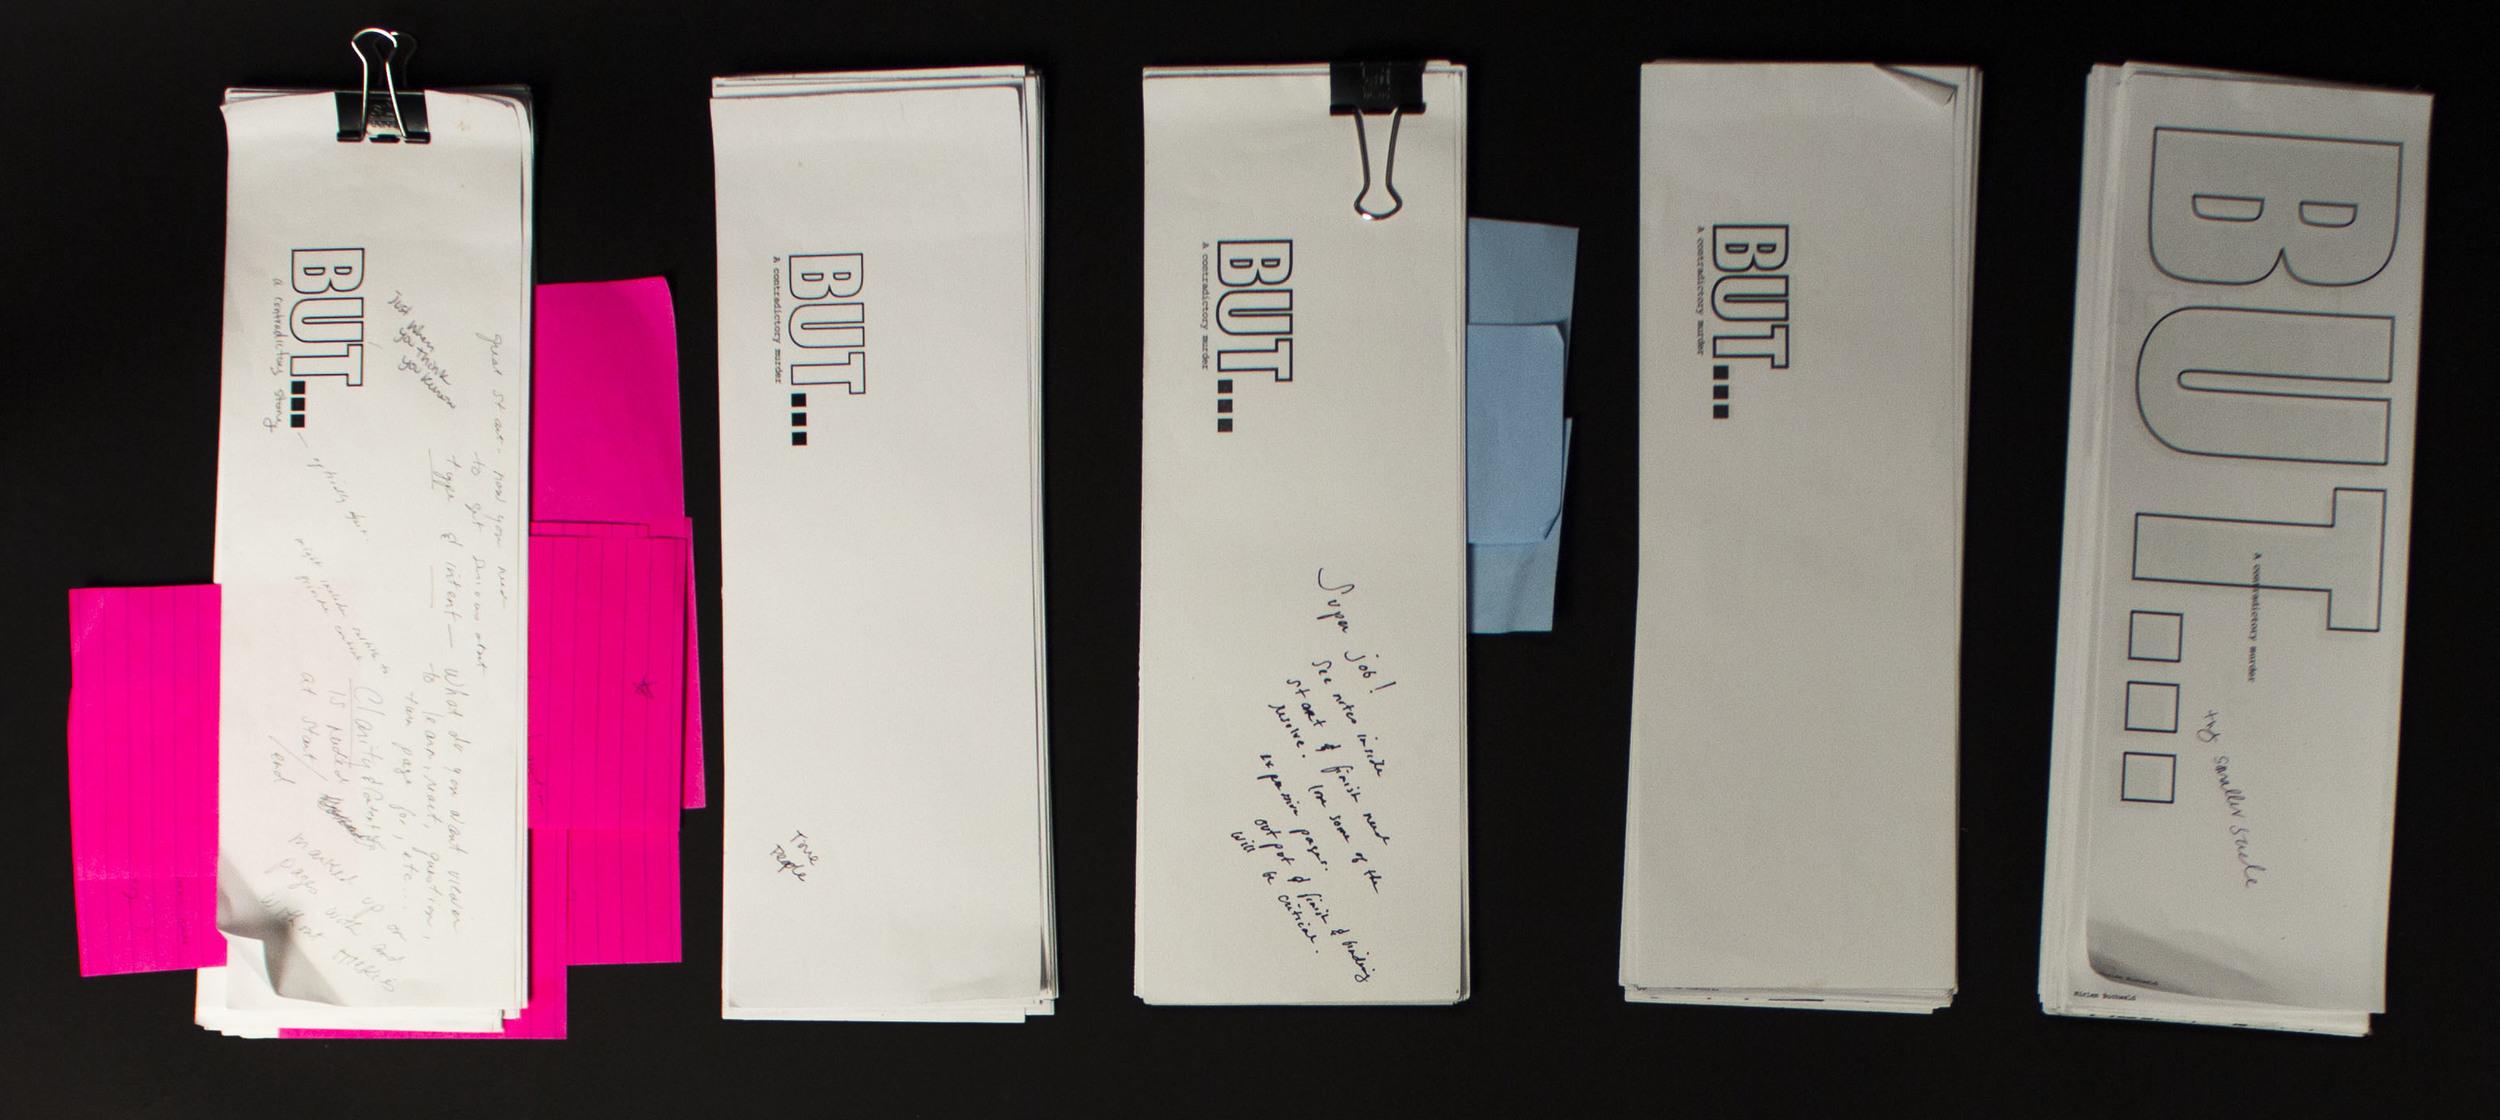 Several Prototypes